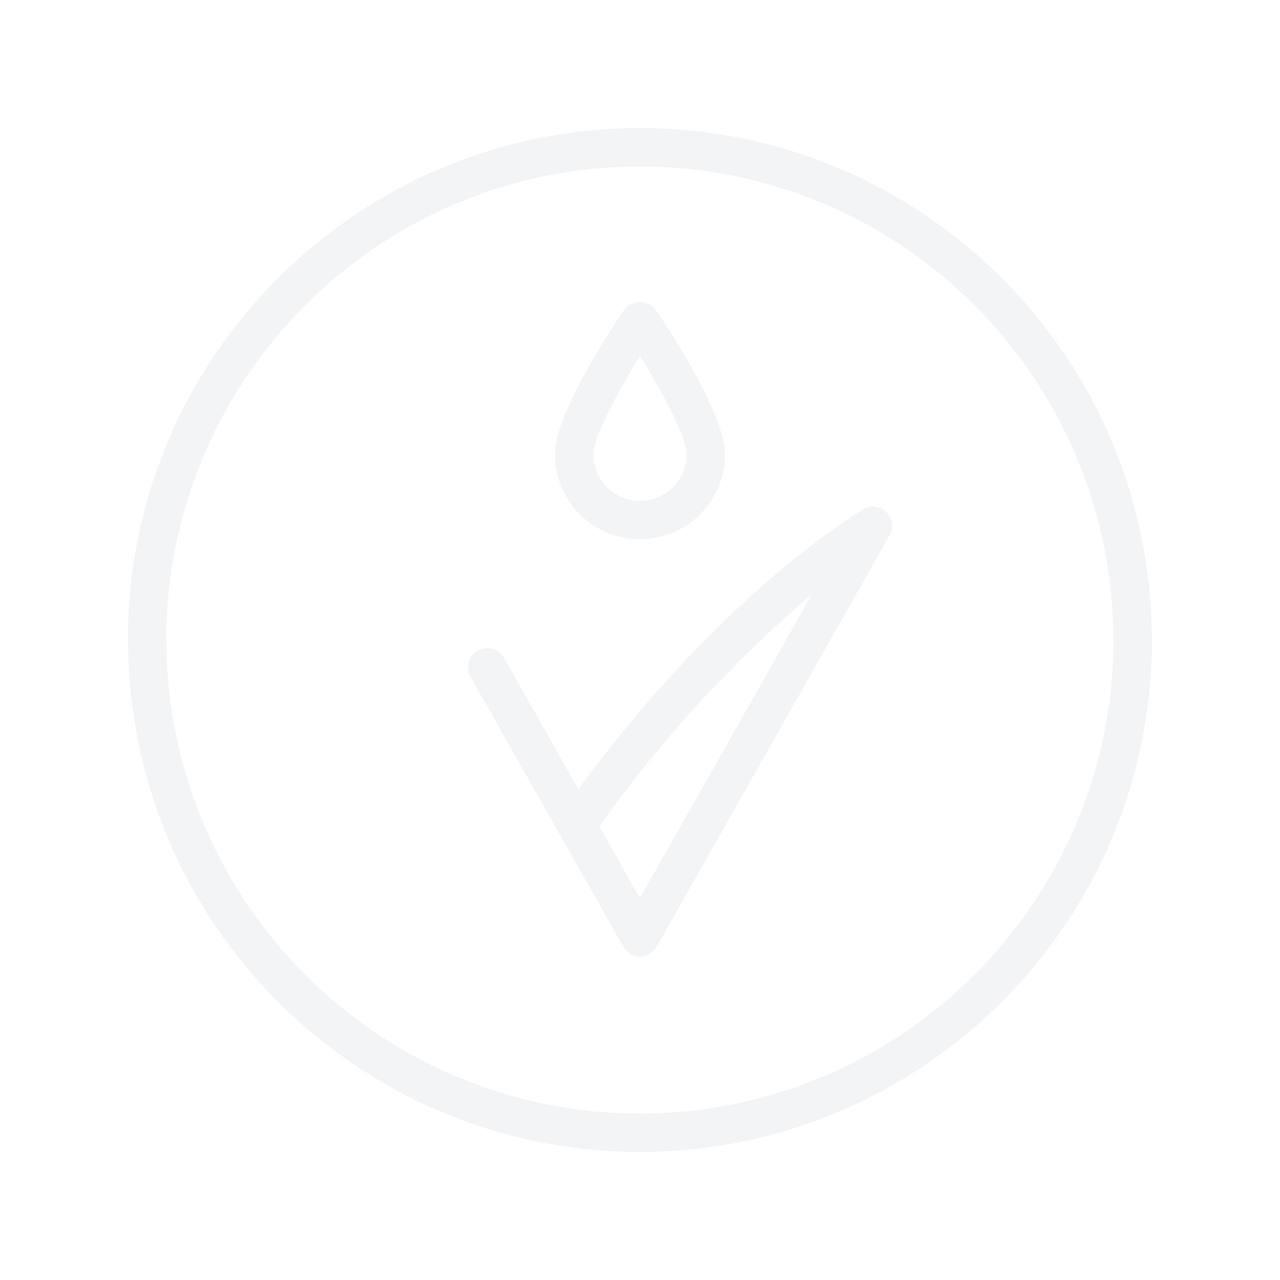 JOIK ORGANIC Warming Magnesium Footbath Salt 230g